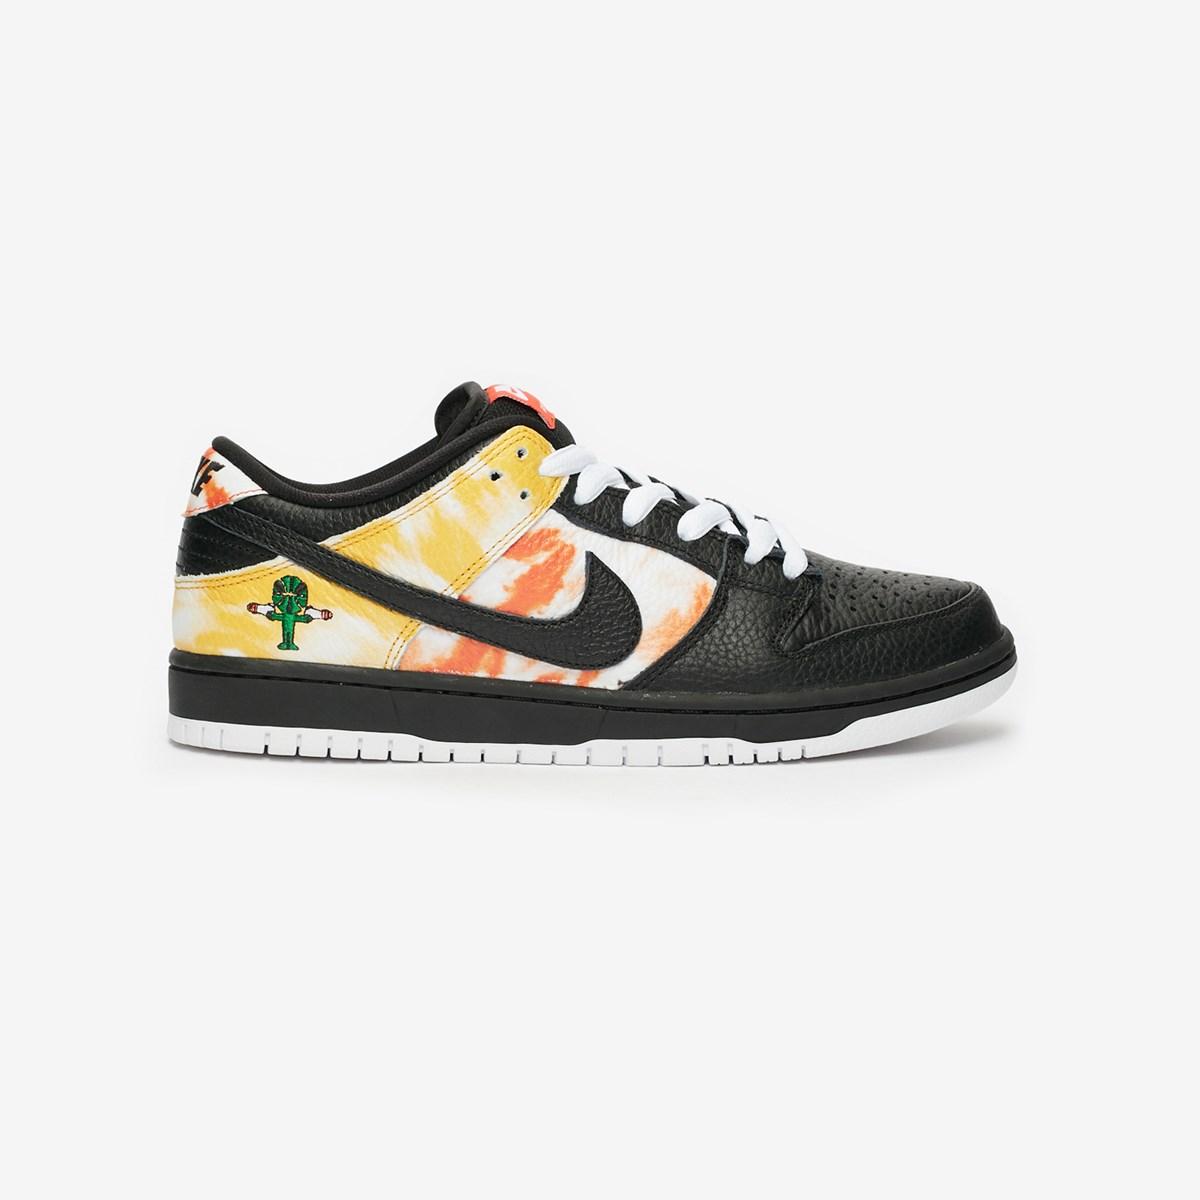 Nike SB Dunk Low Pro QS - Bq6832-001 - Sneakersnstuff   sneakers